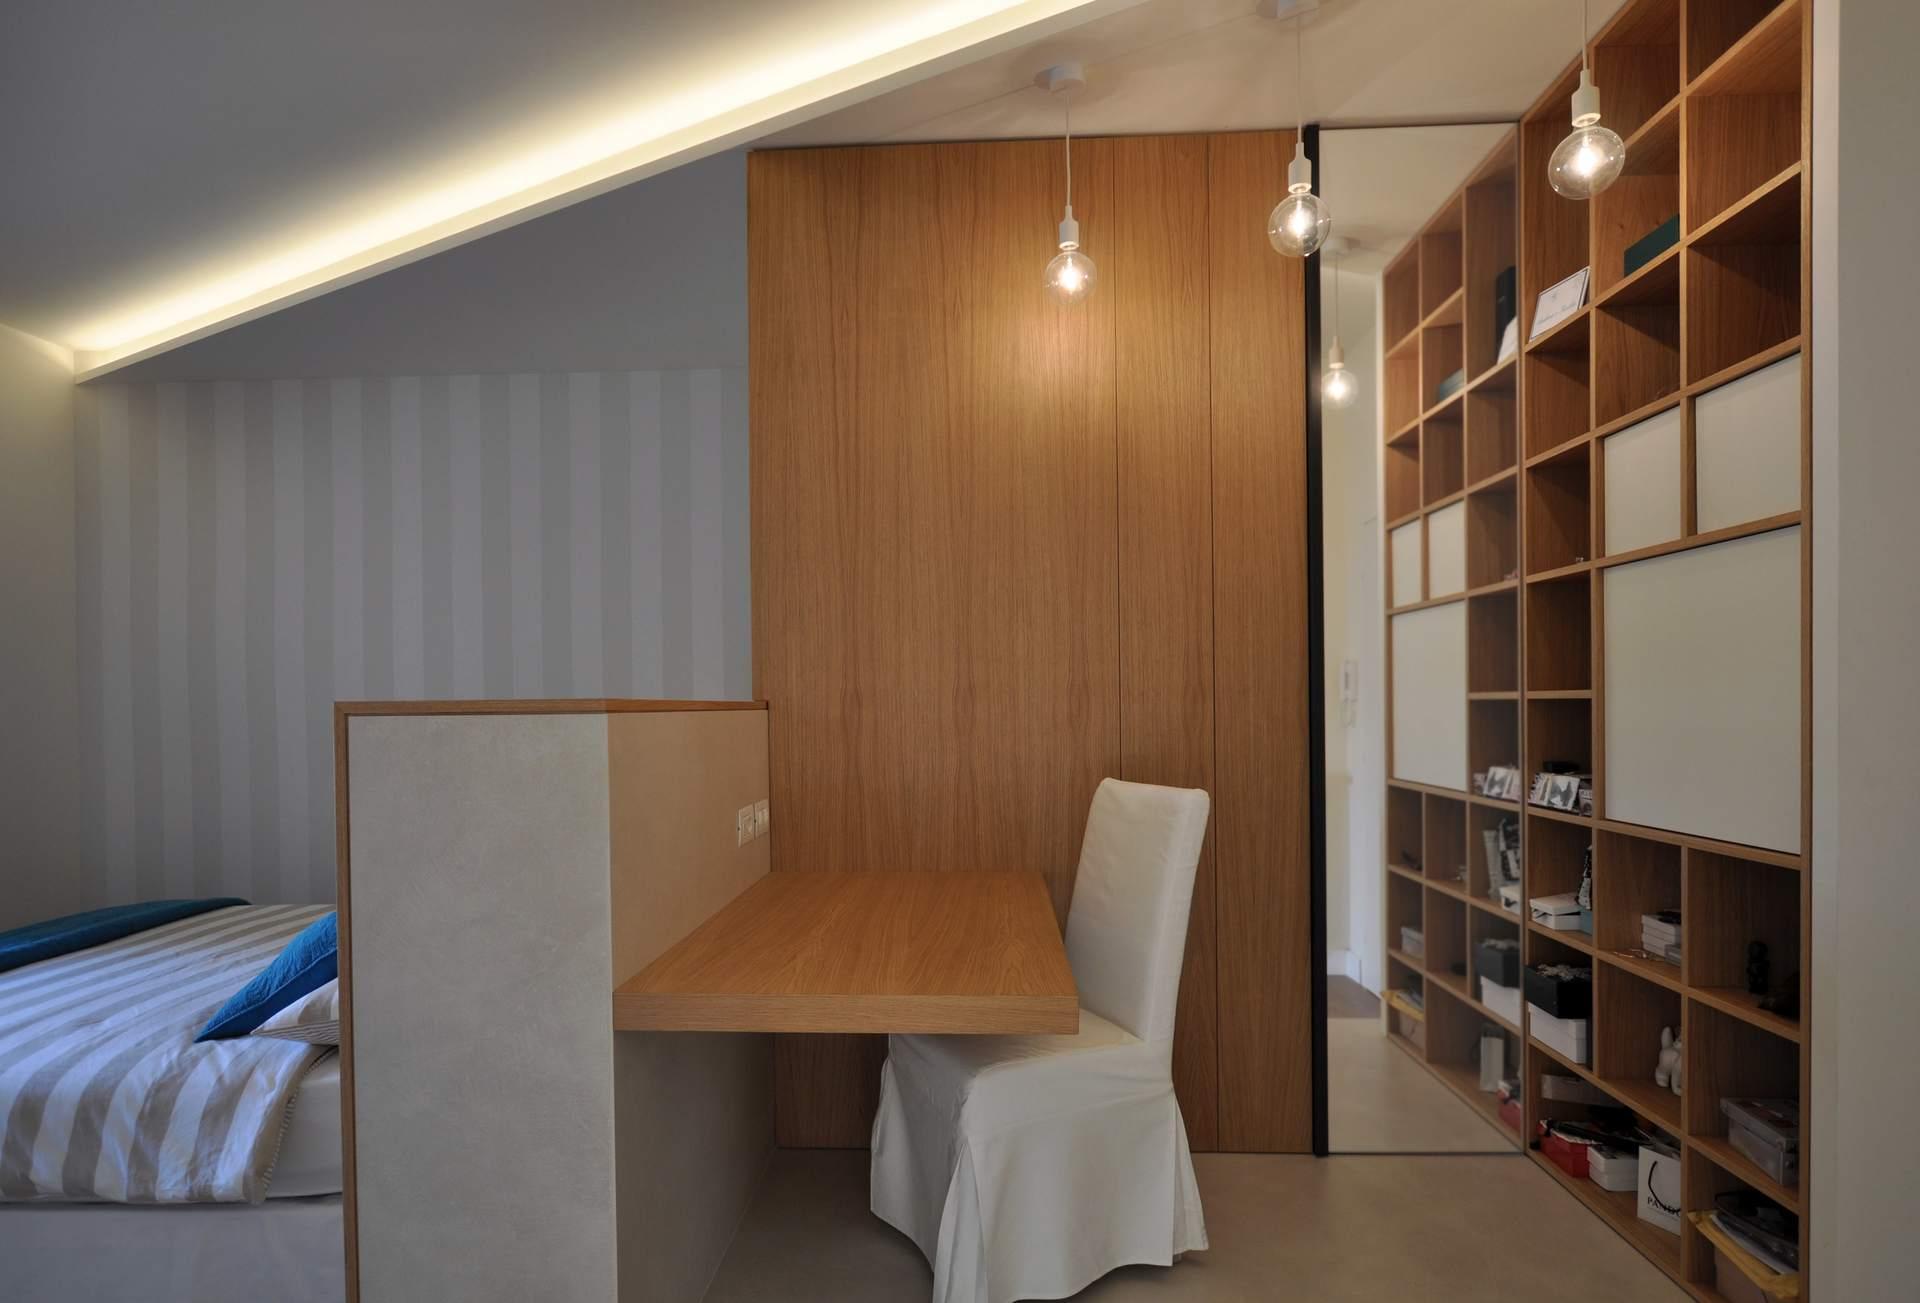 tavolo e sedia